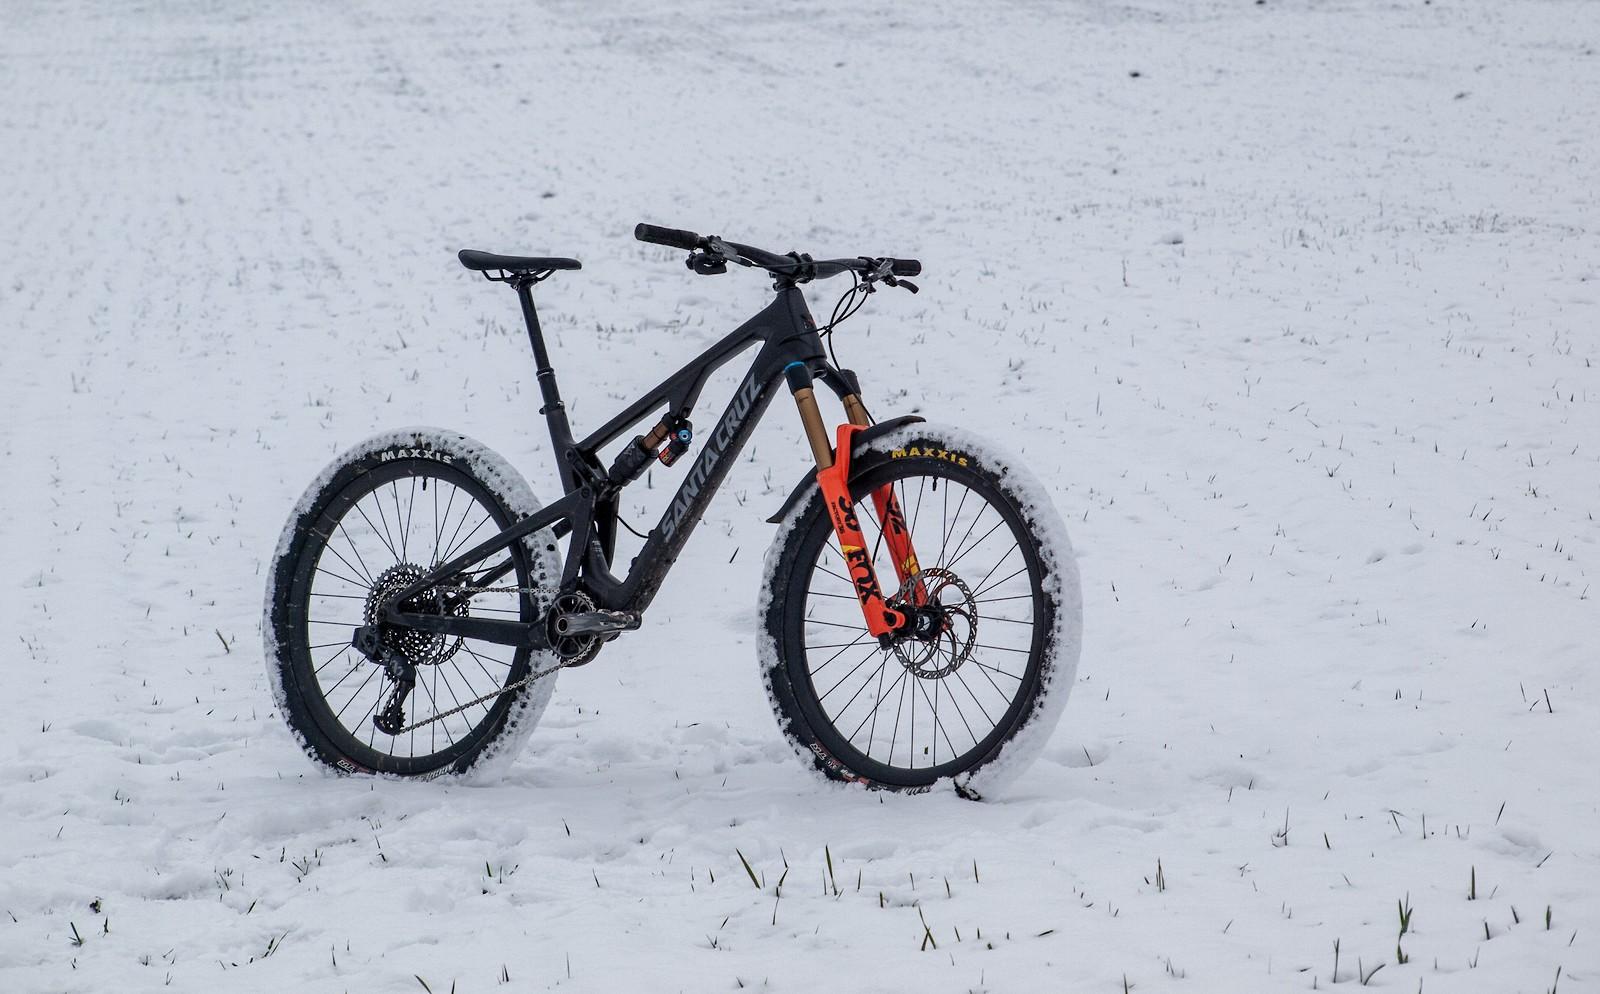 Santa Cruz 5010 V3 - Vital Bike of the Day January 2021 - Mountain Biking Pictures - Vital MTB